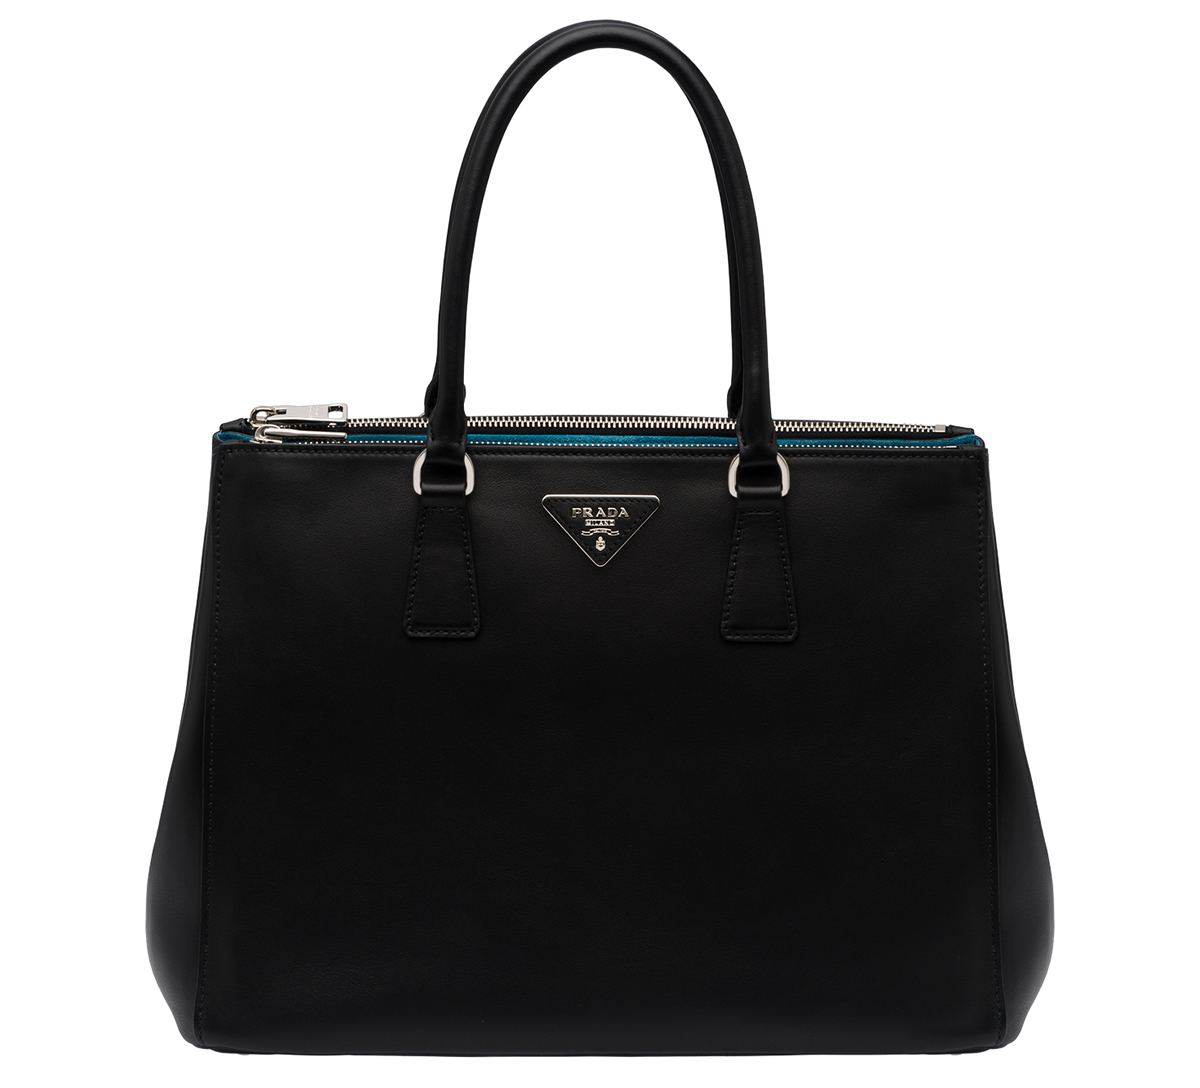 Prada Galleria Bag Black